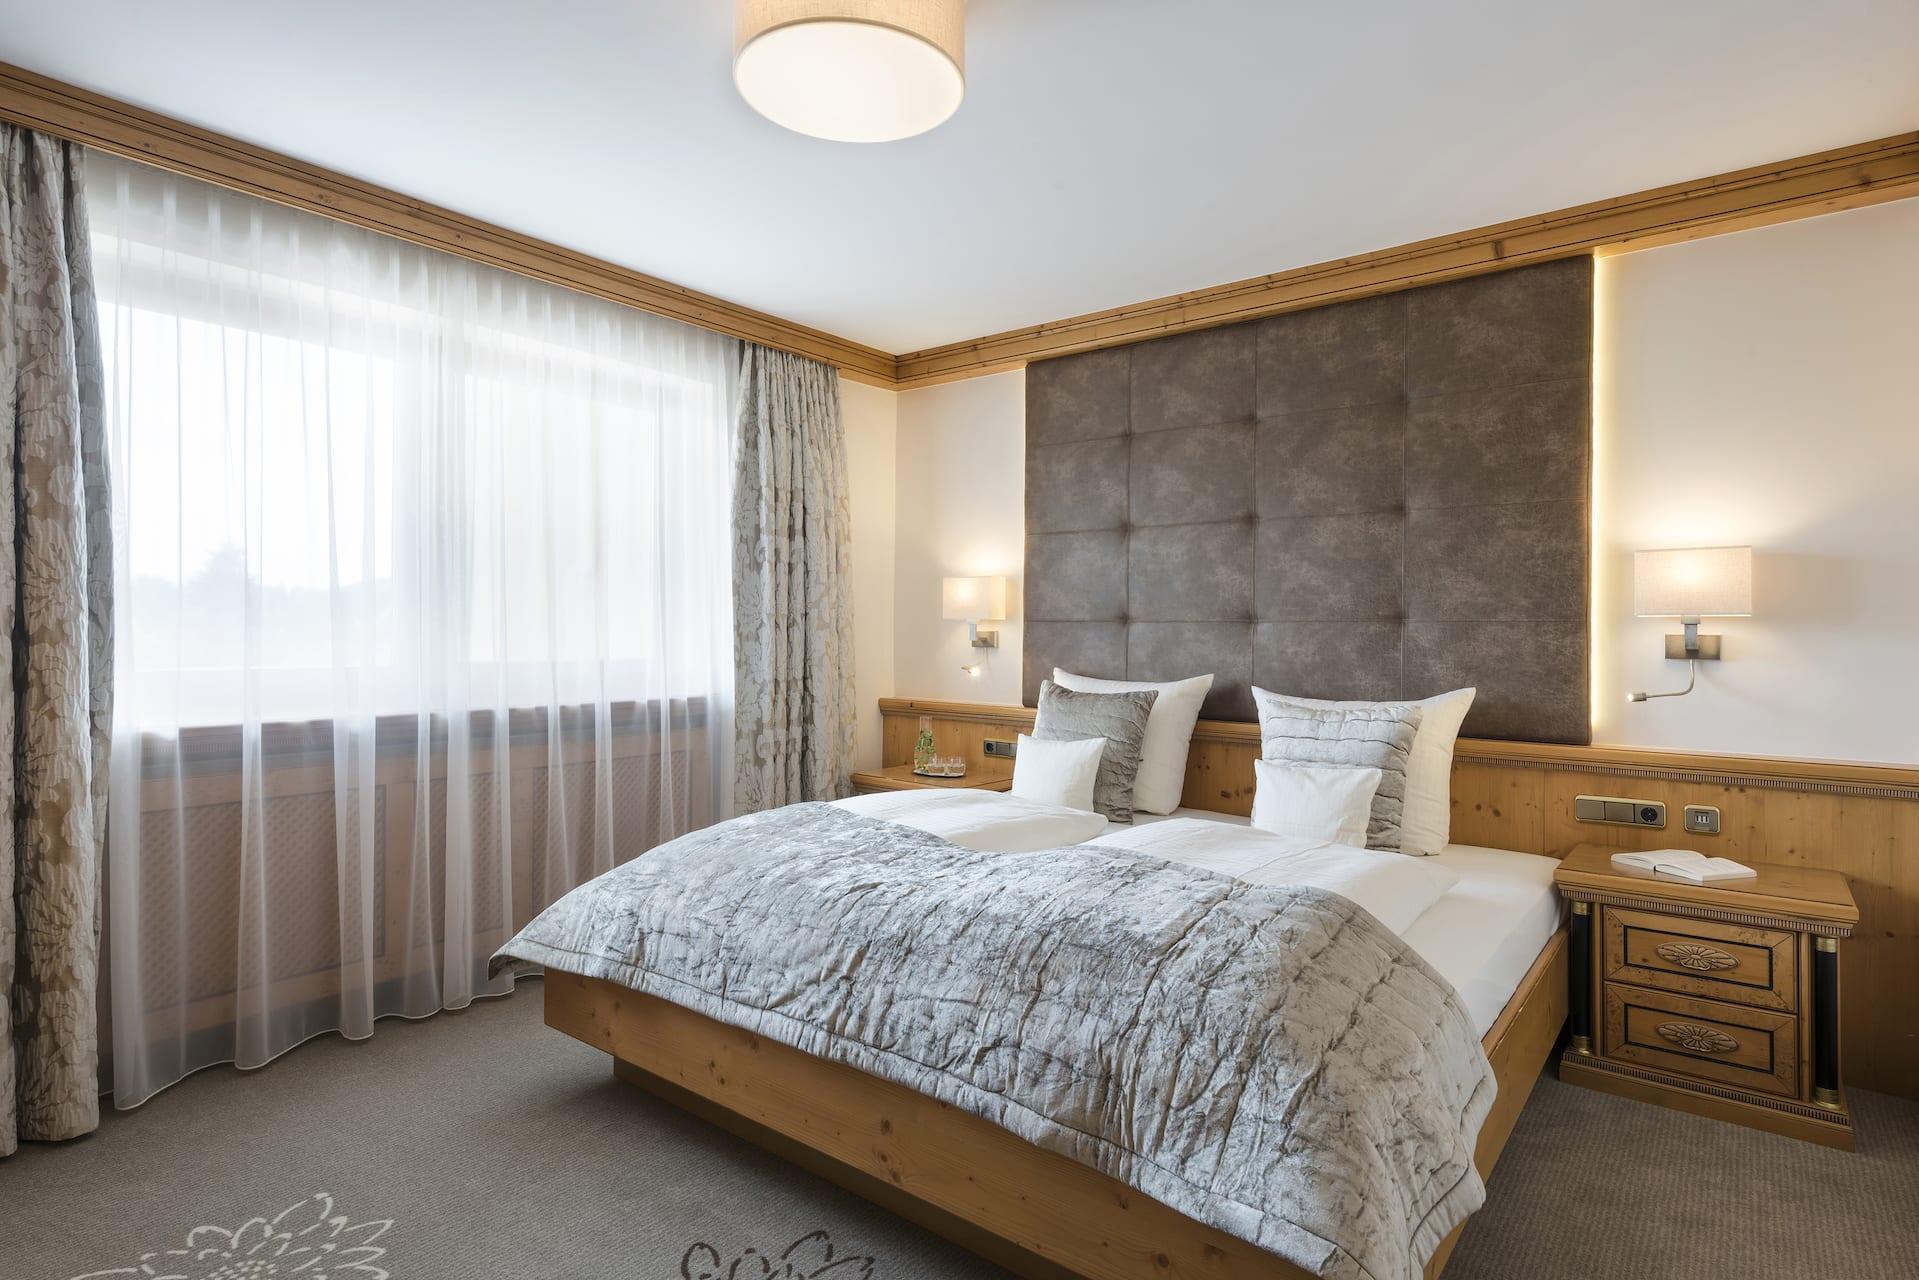 typ 8 doppelzimmer mooshof wellnesshotel bodenmais wellness hotels, Schlafzimmer entwurf